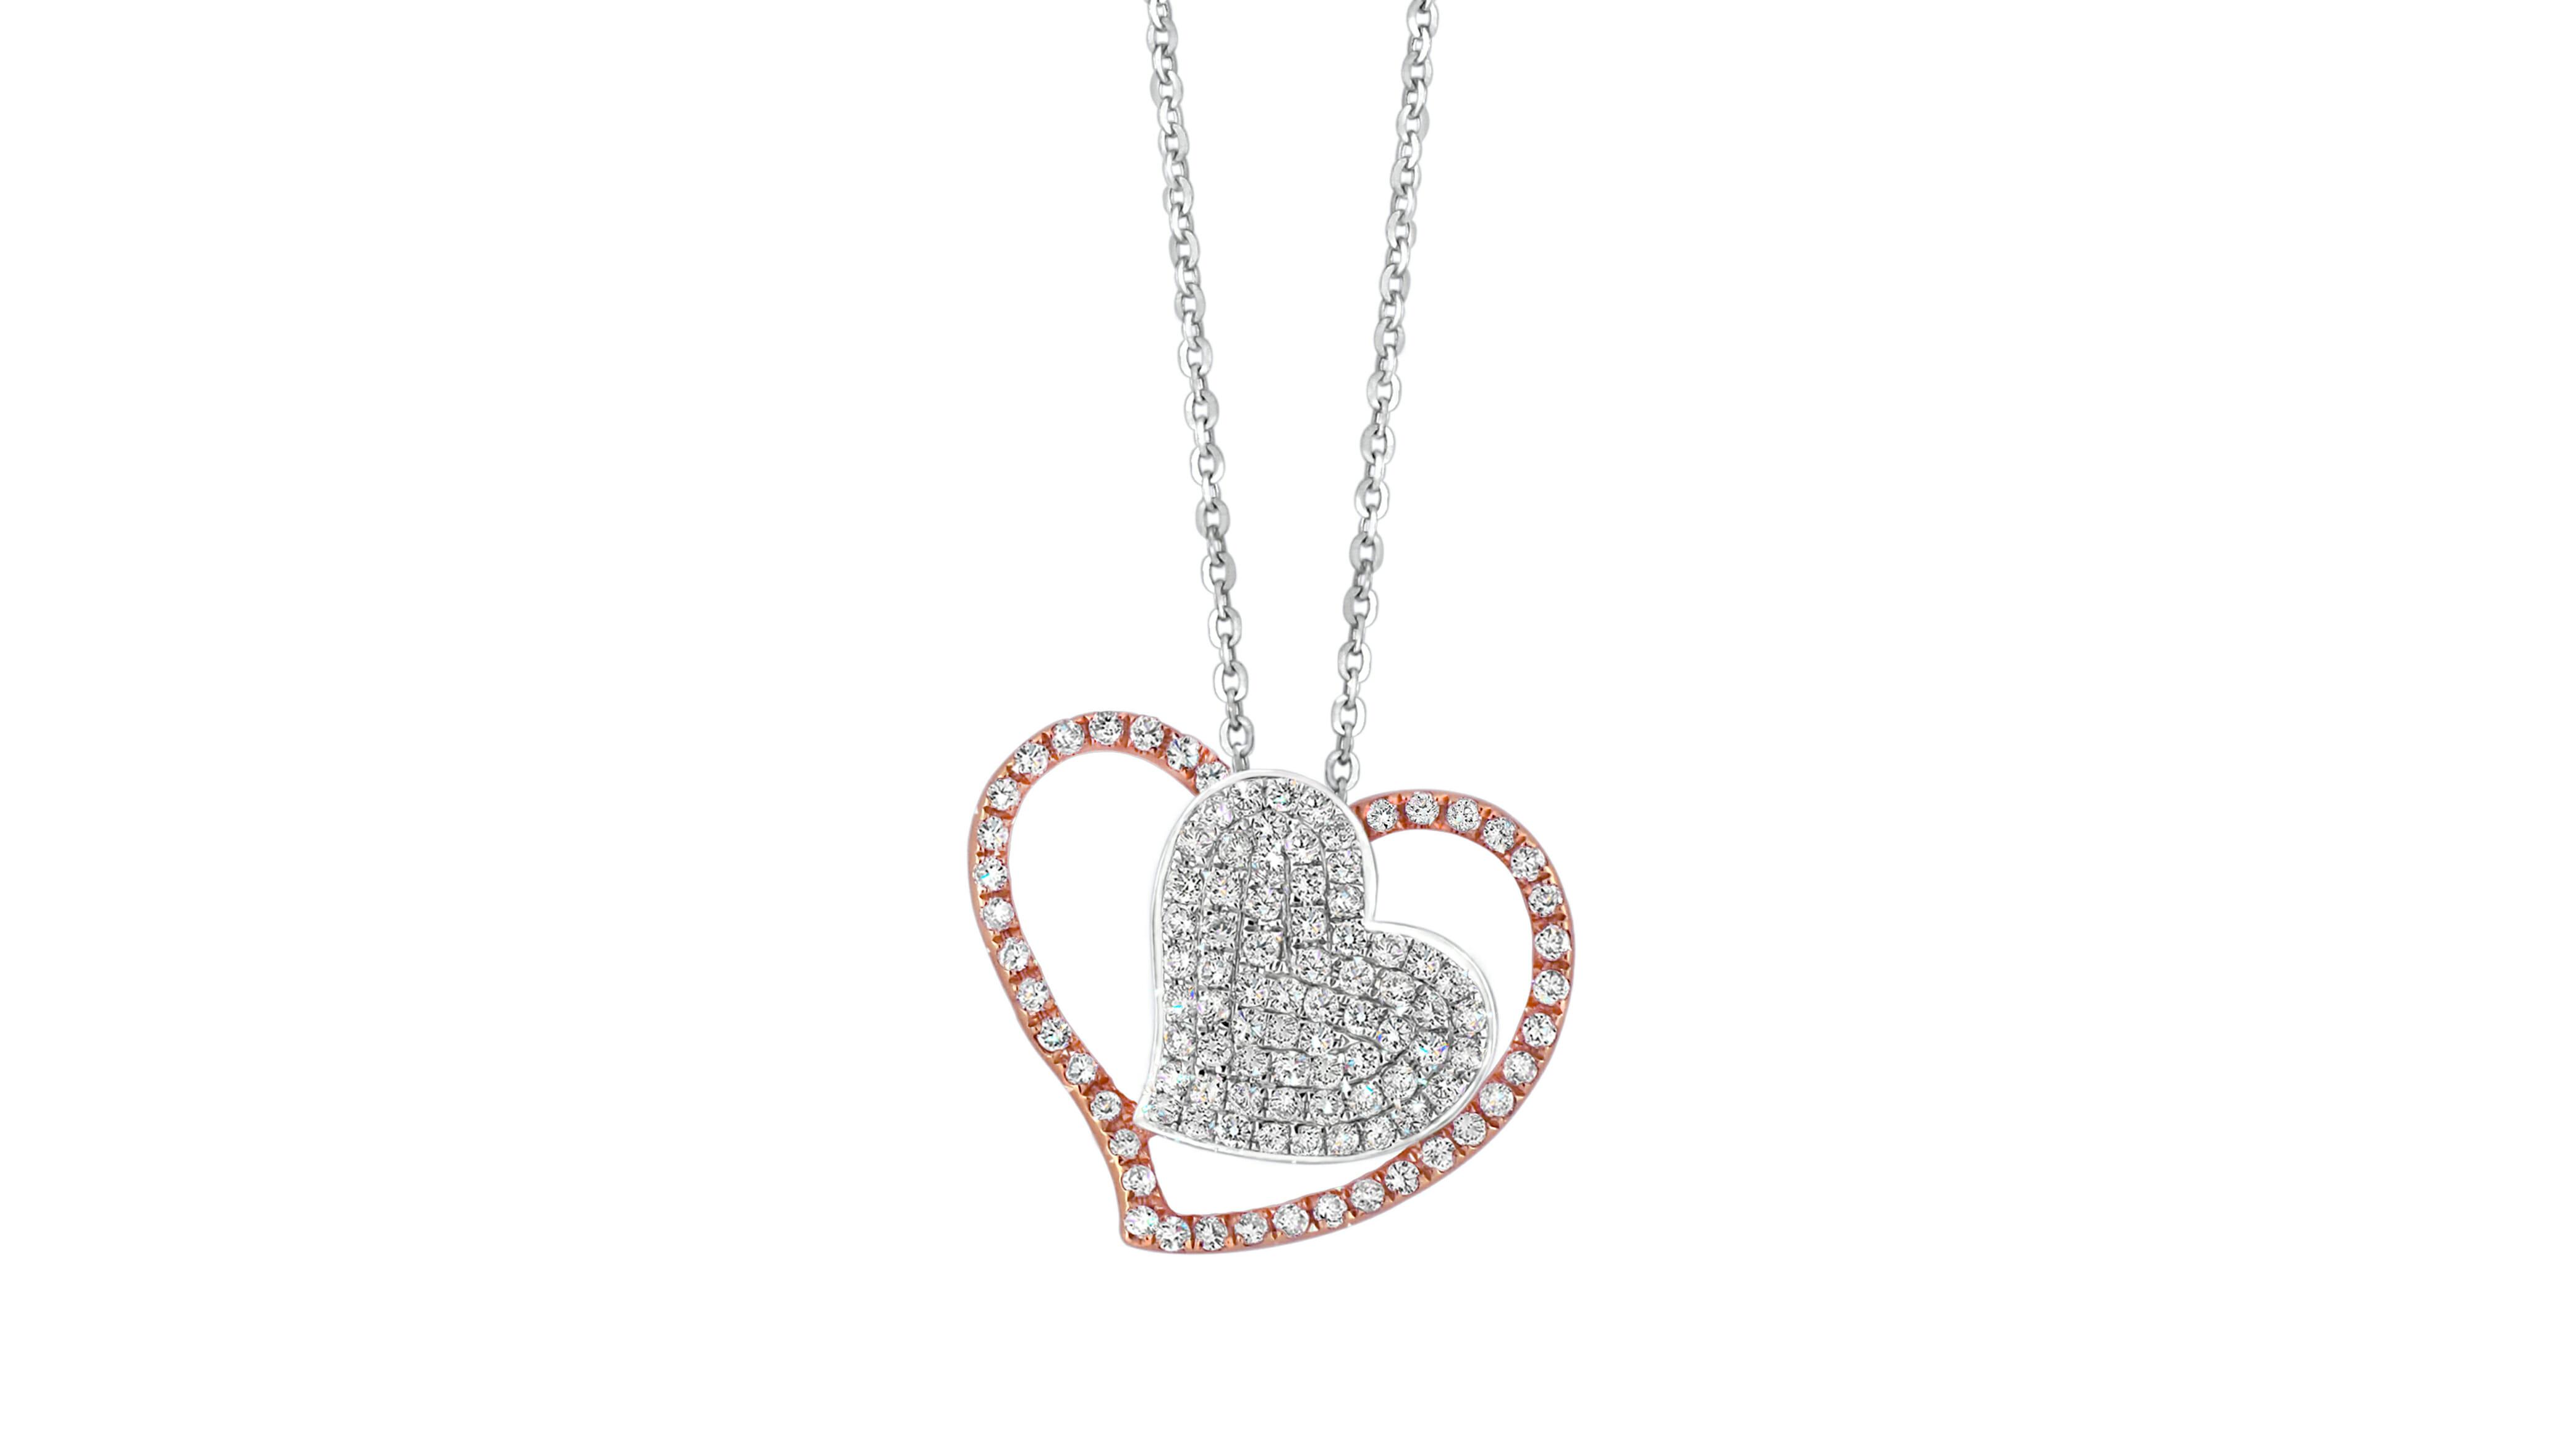 Two Tone Diamond Pavé Heart Pendant | A rose gold and white gold diamond heart pendant